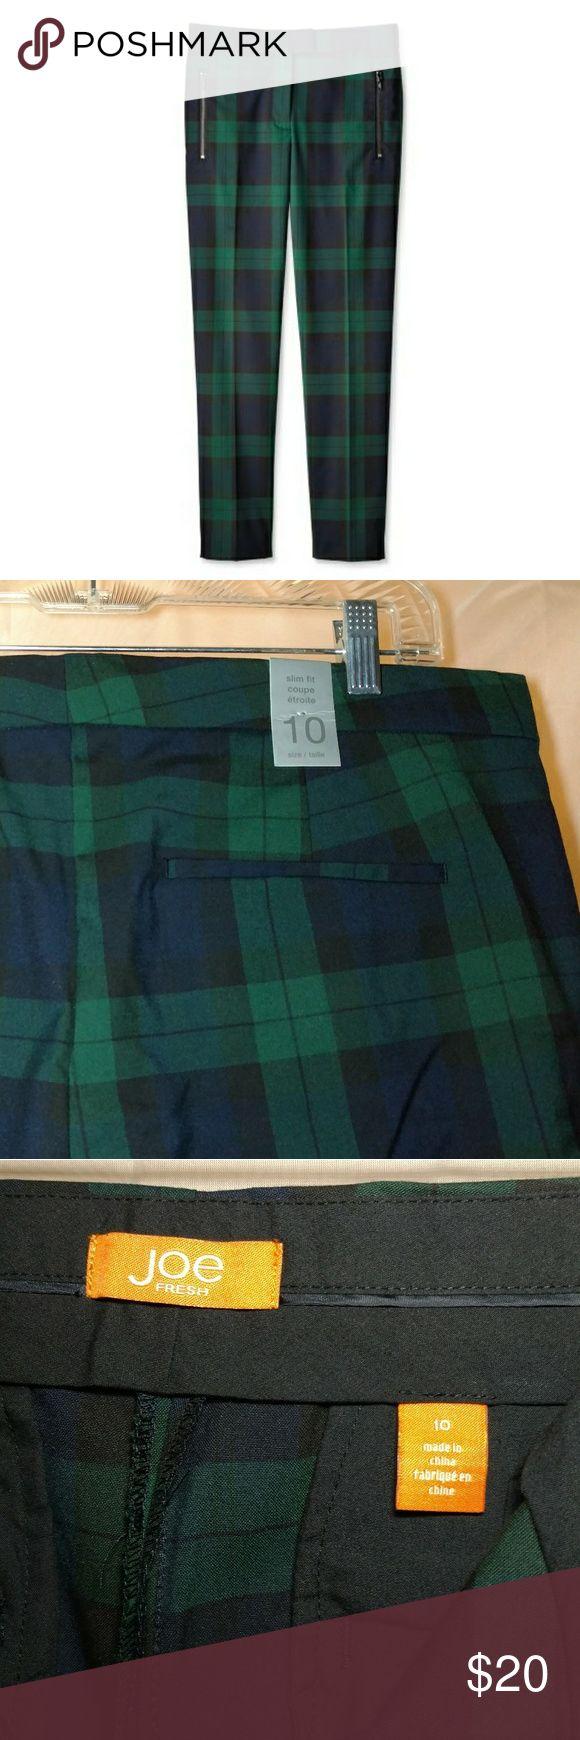 NWT Joe Fresh Slim Fit Pant Joe Fresh Slim Fit Pant / NWT, never worn / Black Watch Tartan / Zip Front Pockets / 65% Poly 33% Viscose 2% Spandex Joe Fresh Pants Trousers